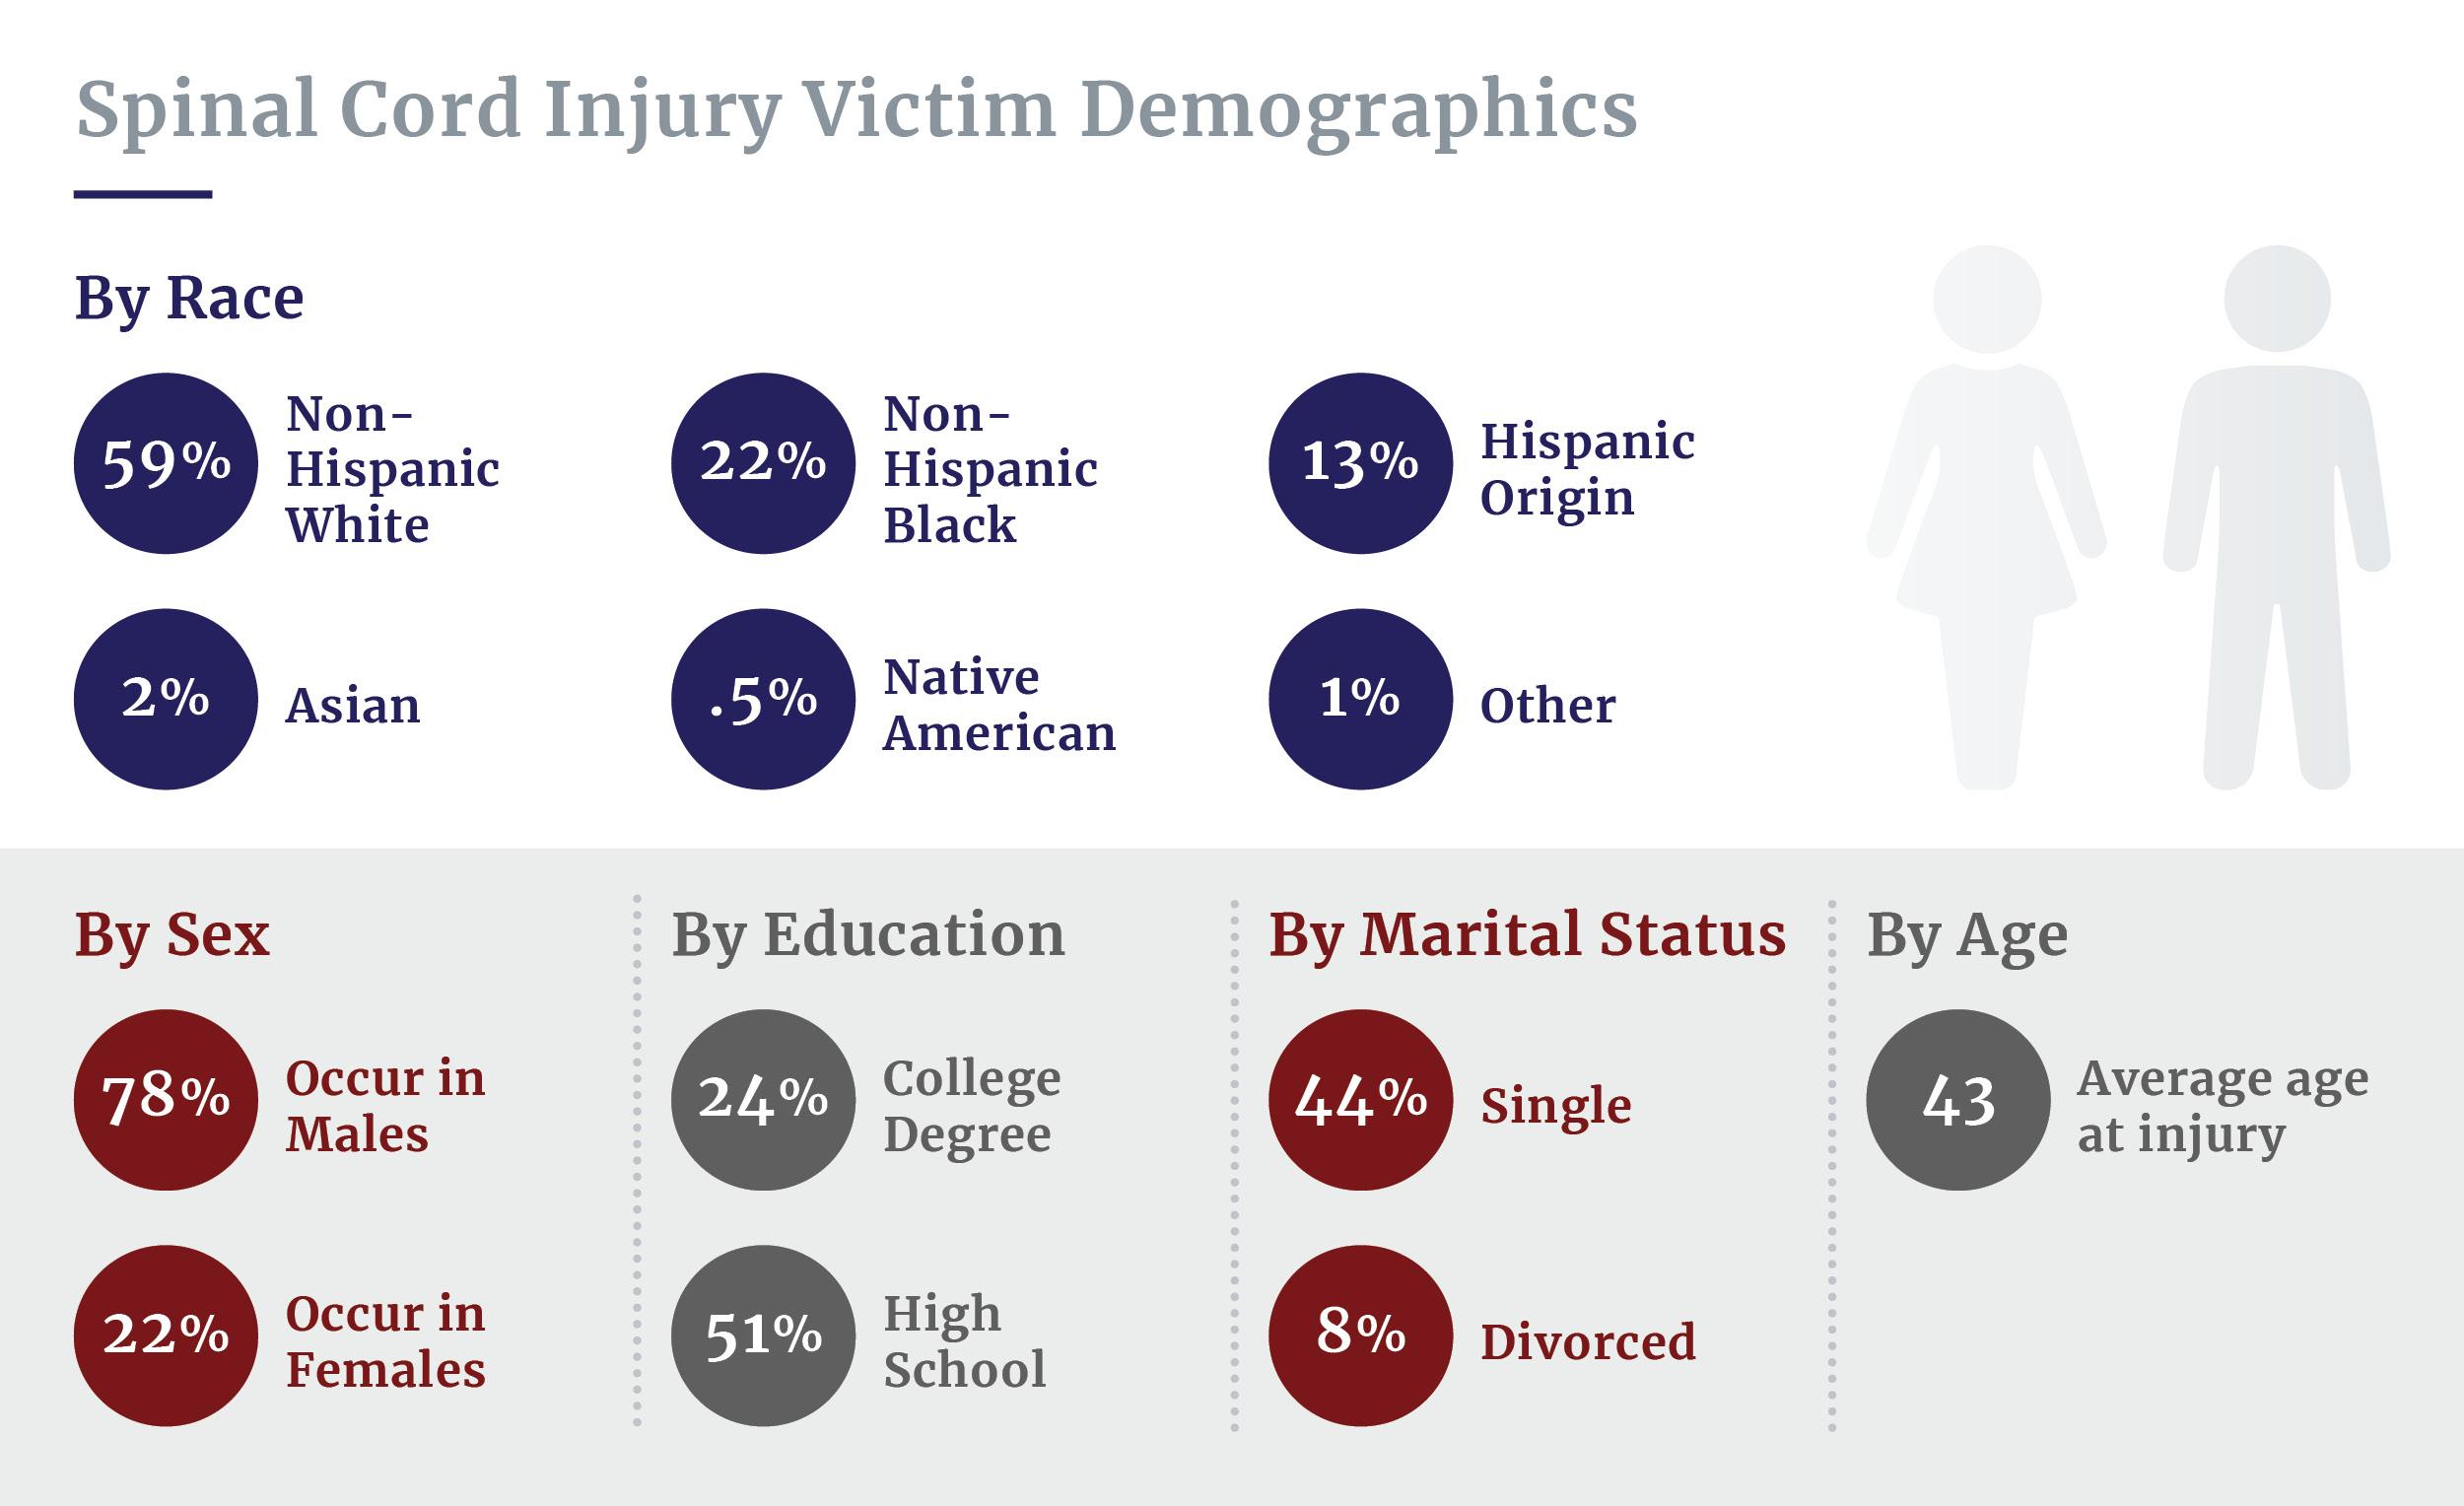 Spinal cord injury victim demographics